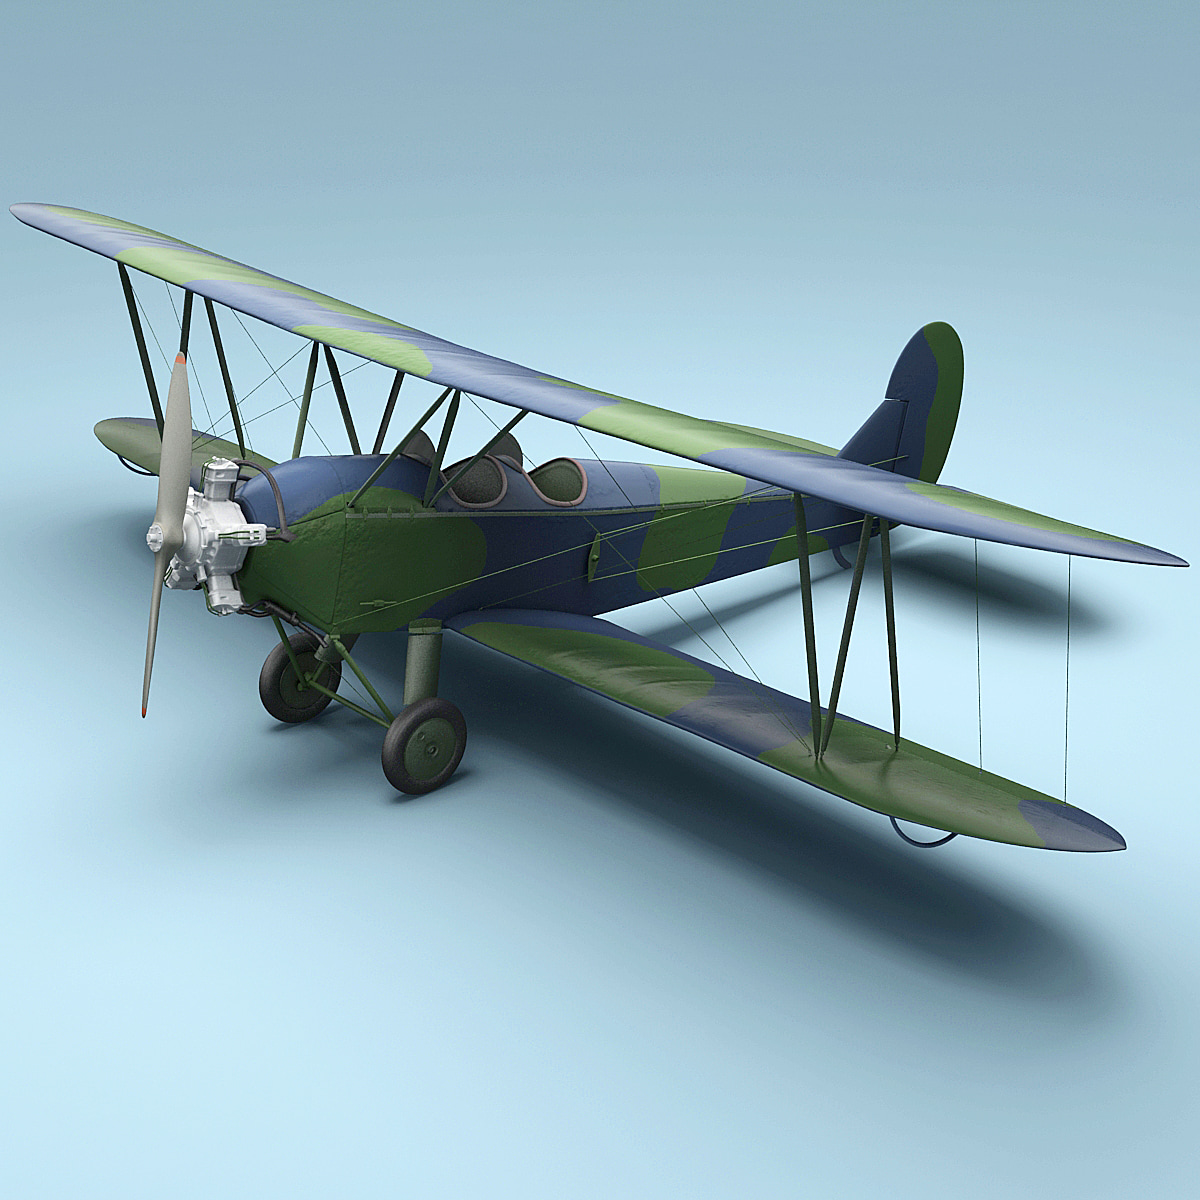 Plane_Polikarpov_Po-2_001.jpg